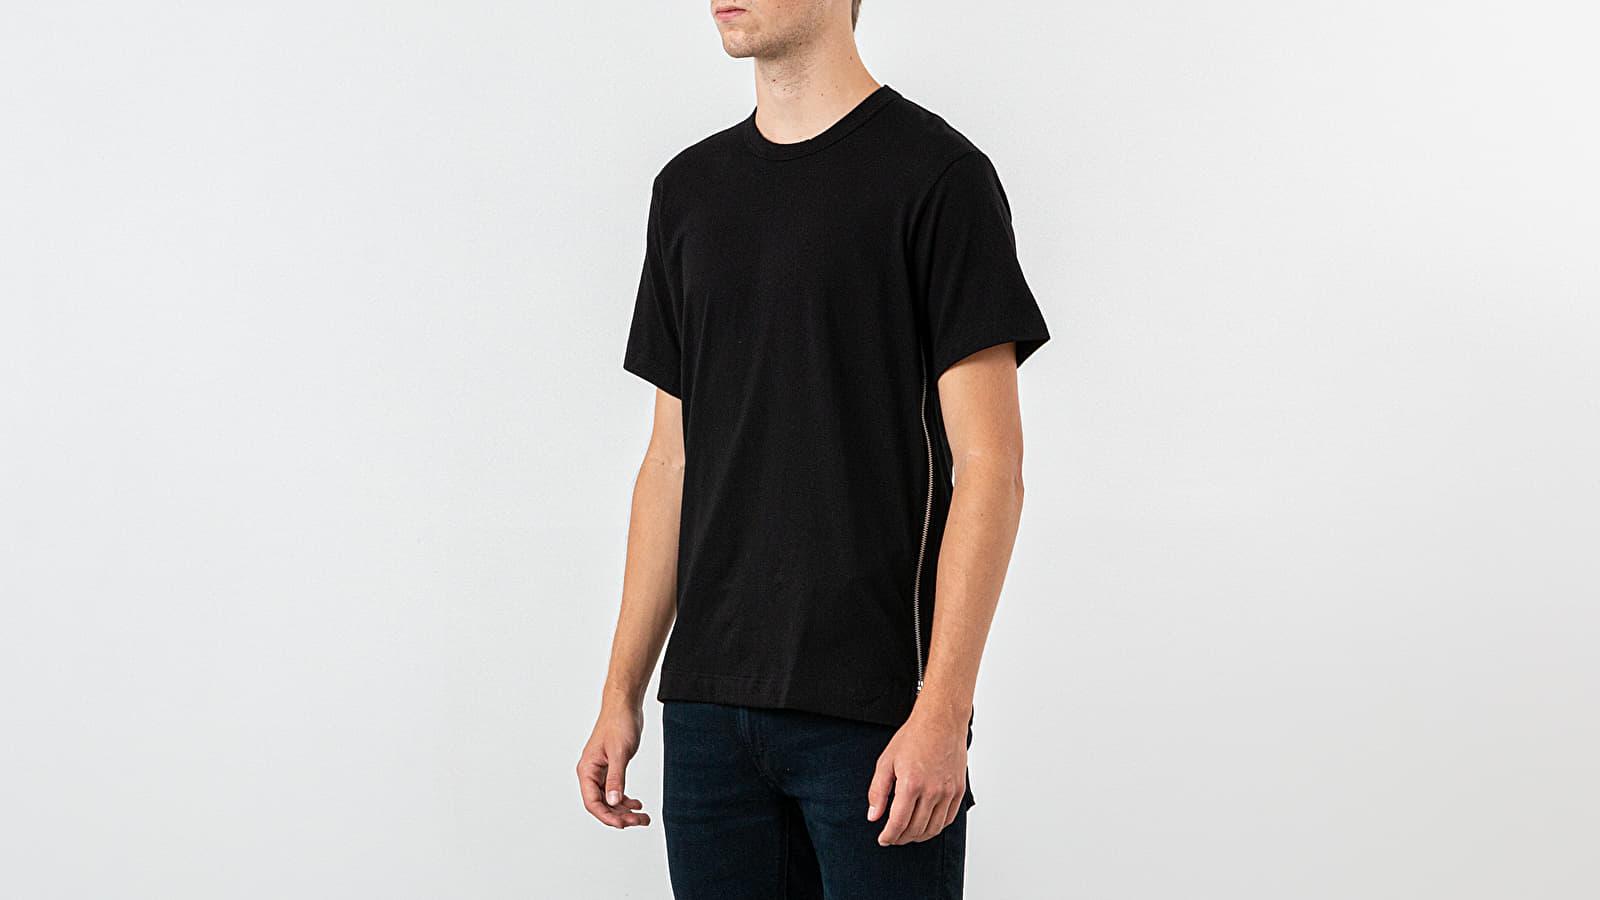 T-shirts Comme des Garçons SHIRT Tee Black